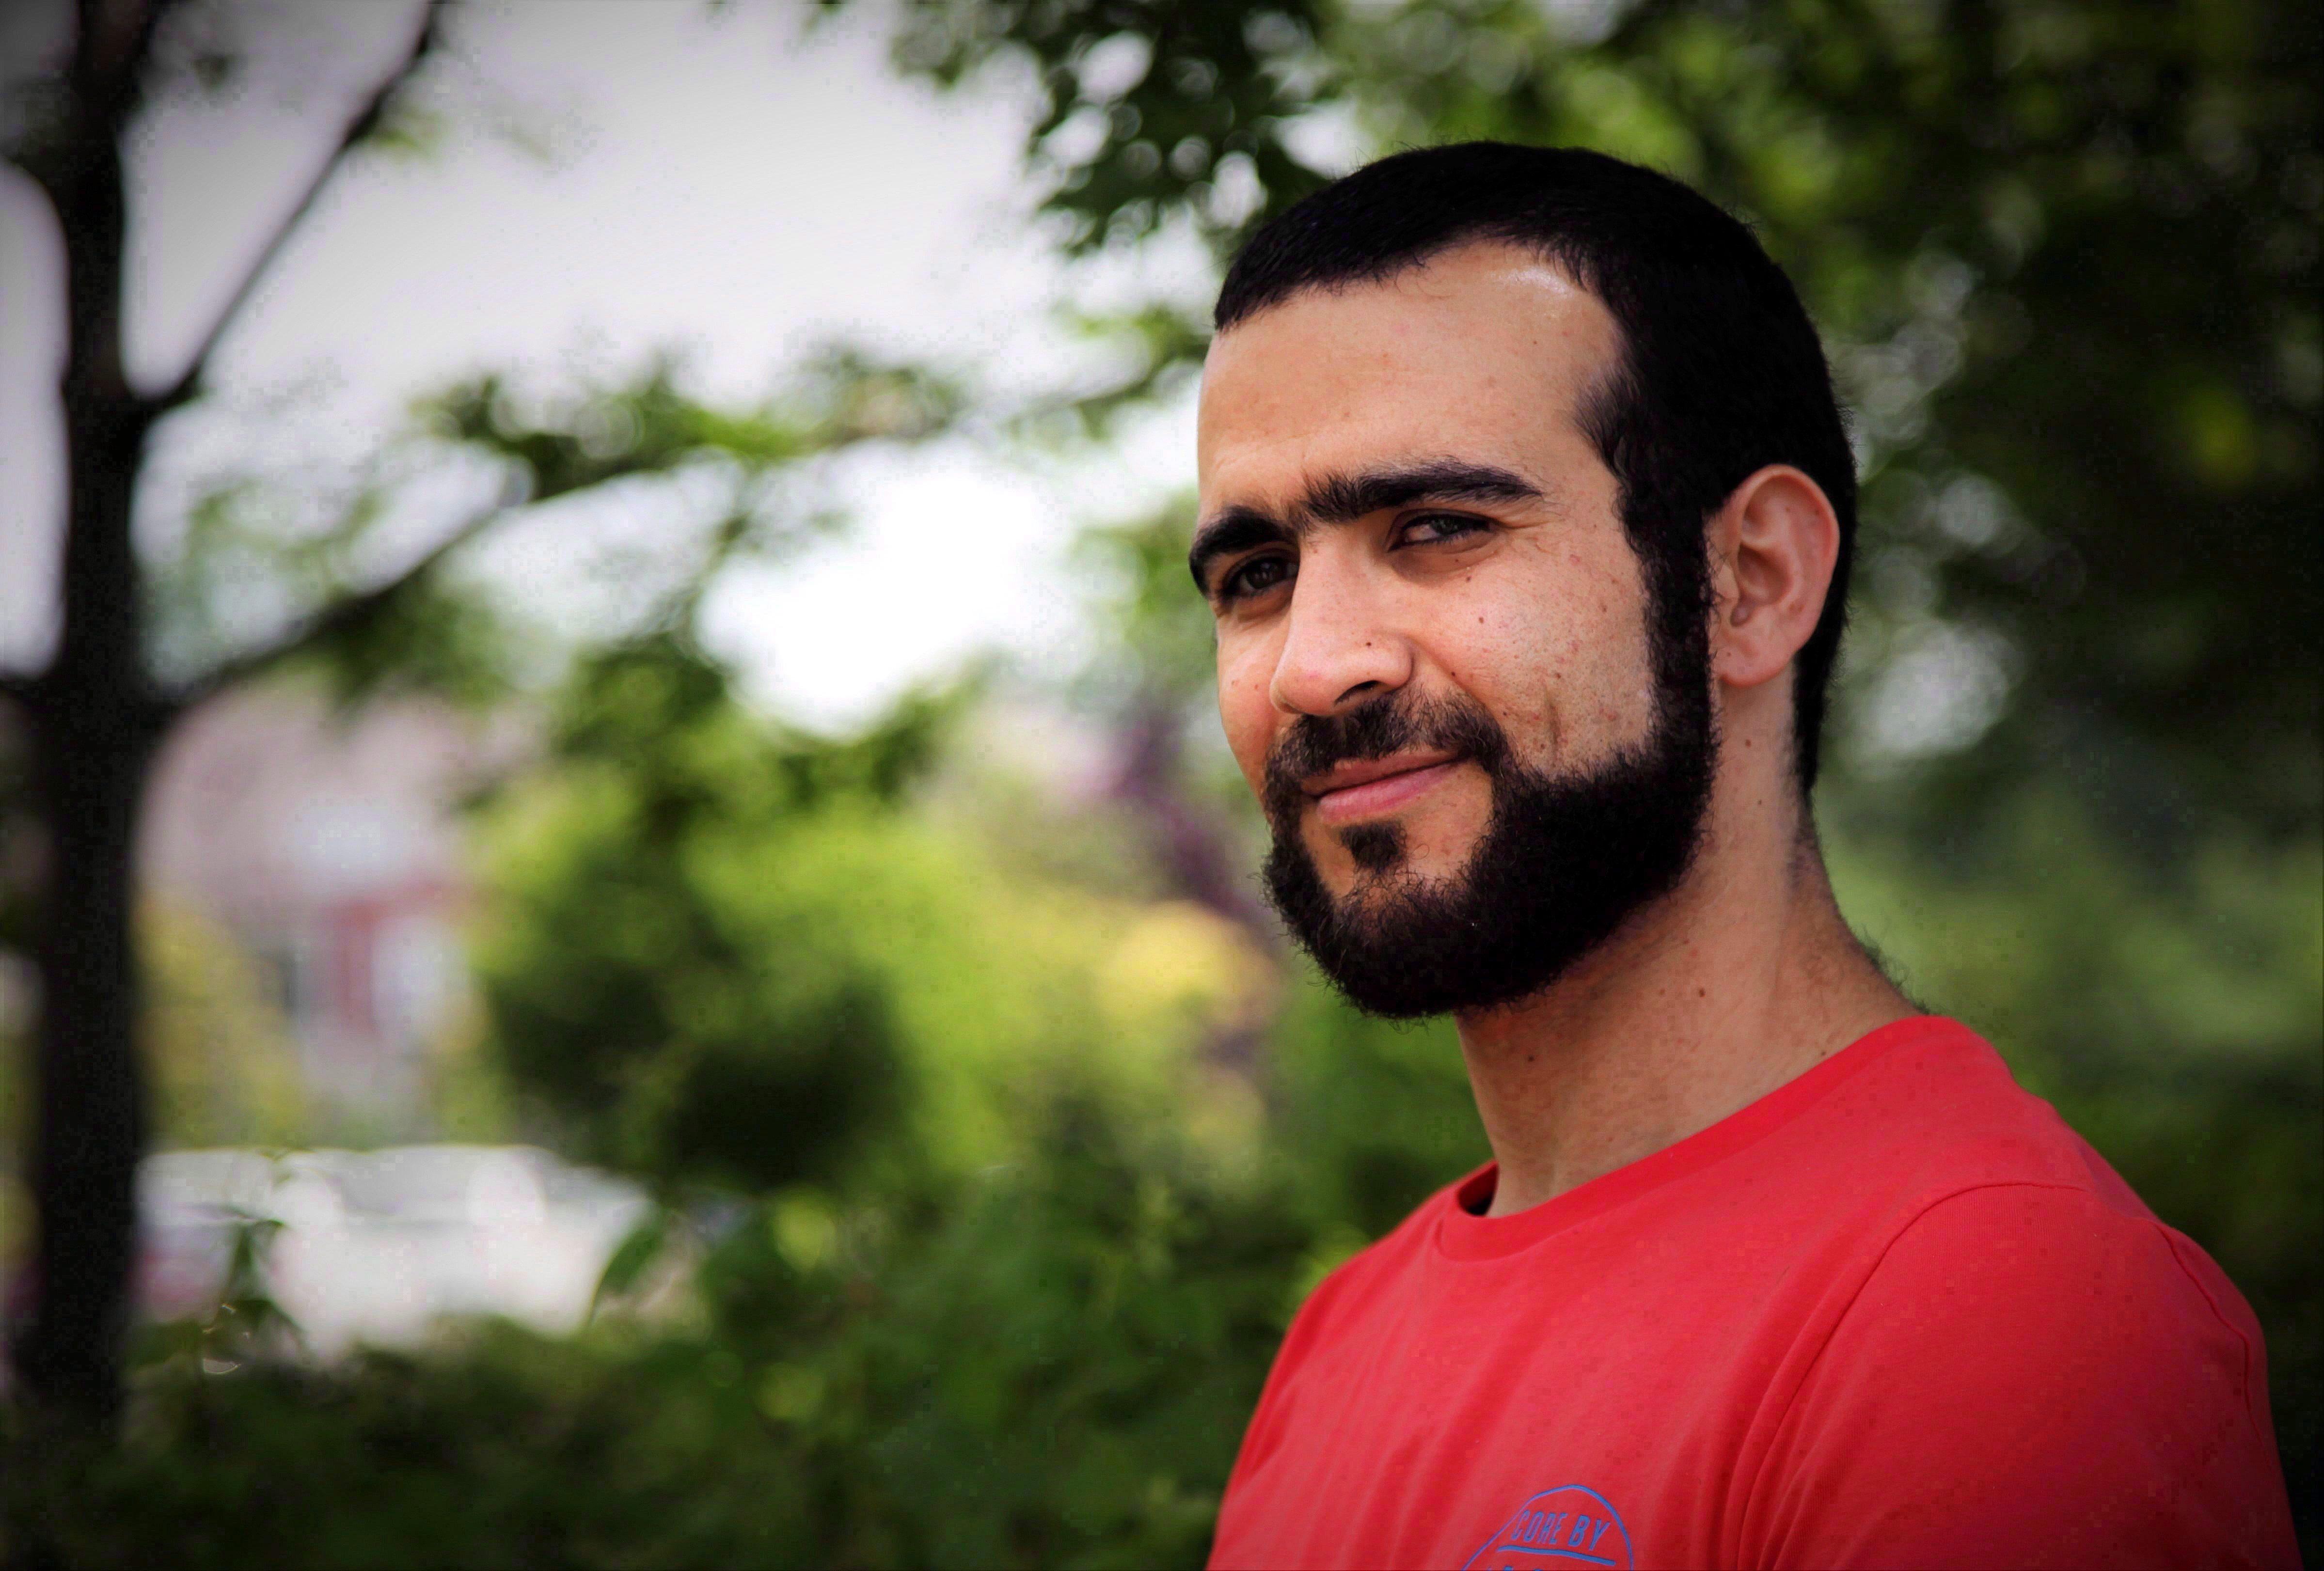 Former Guantanamo Bay prisoner Omar Khadr, 30, is seen in Mississauga, Ont., on Thursday, July 6,